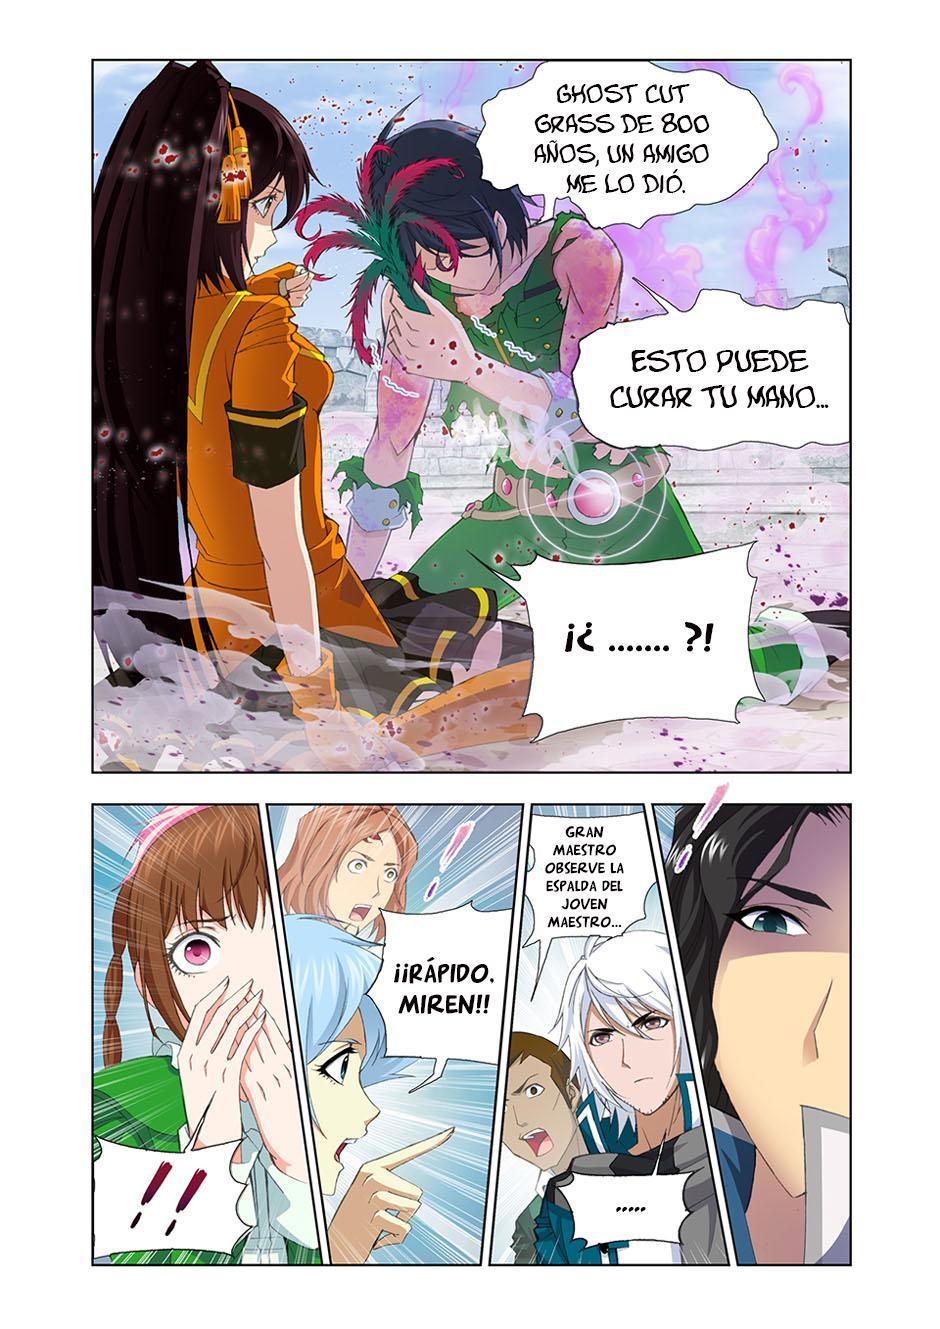 http://c5.ninemanga.com/es_manga/18/16210/417583/46b8a0e73f80ac66c8fb8ec871748e4f.jpg Page 9